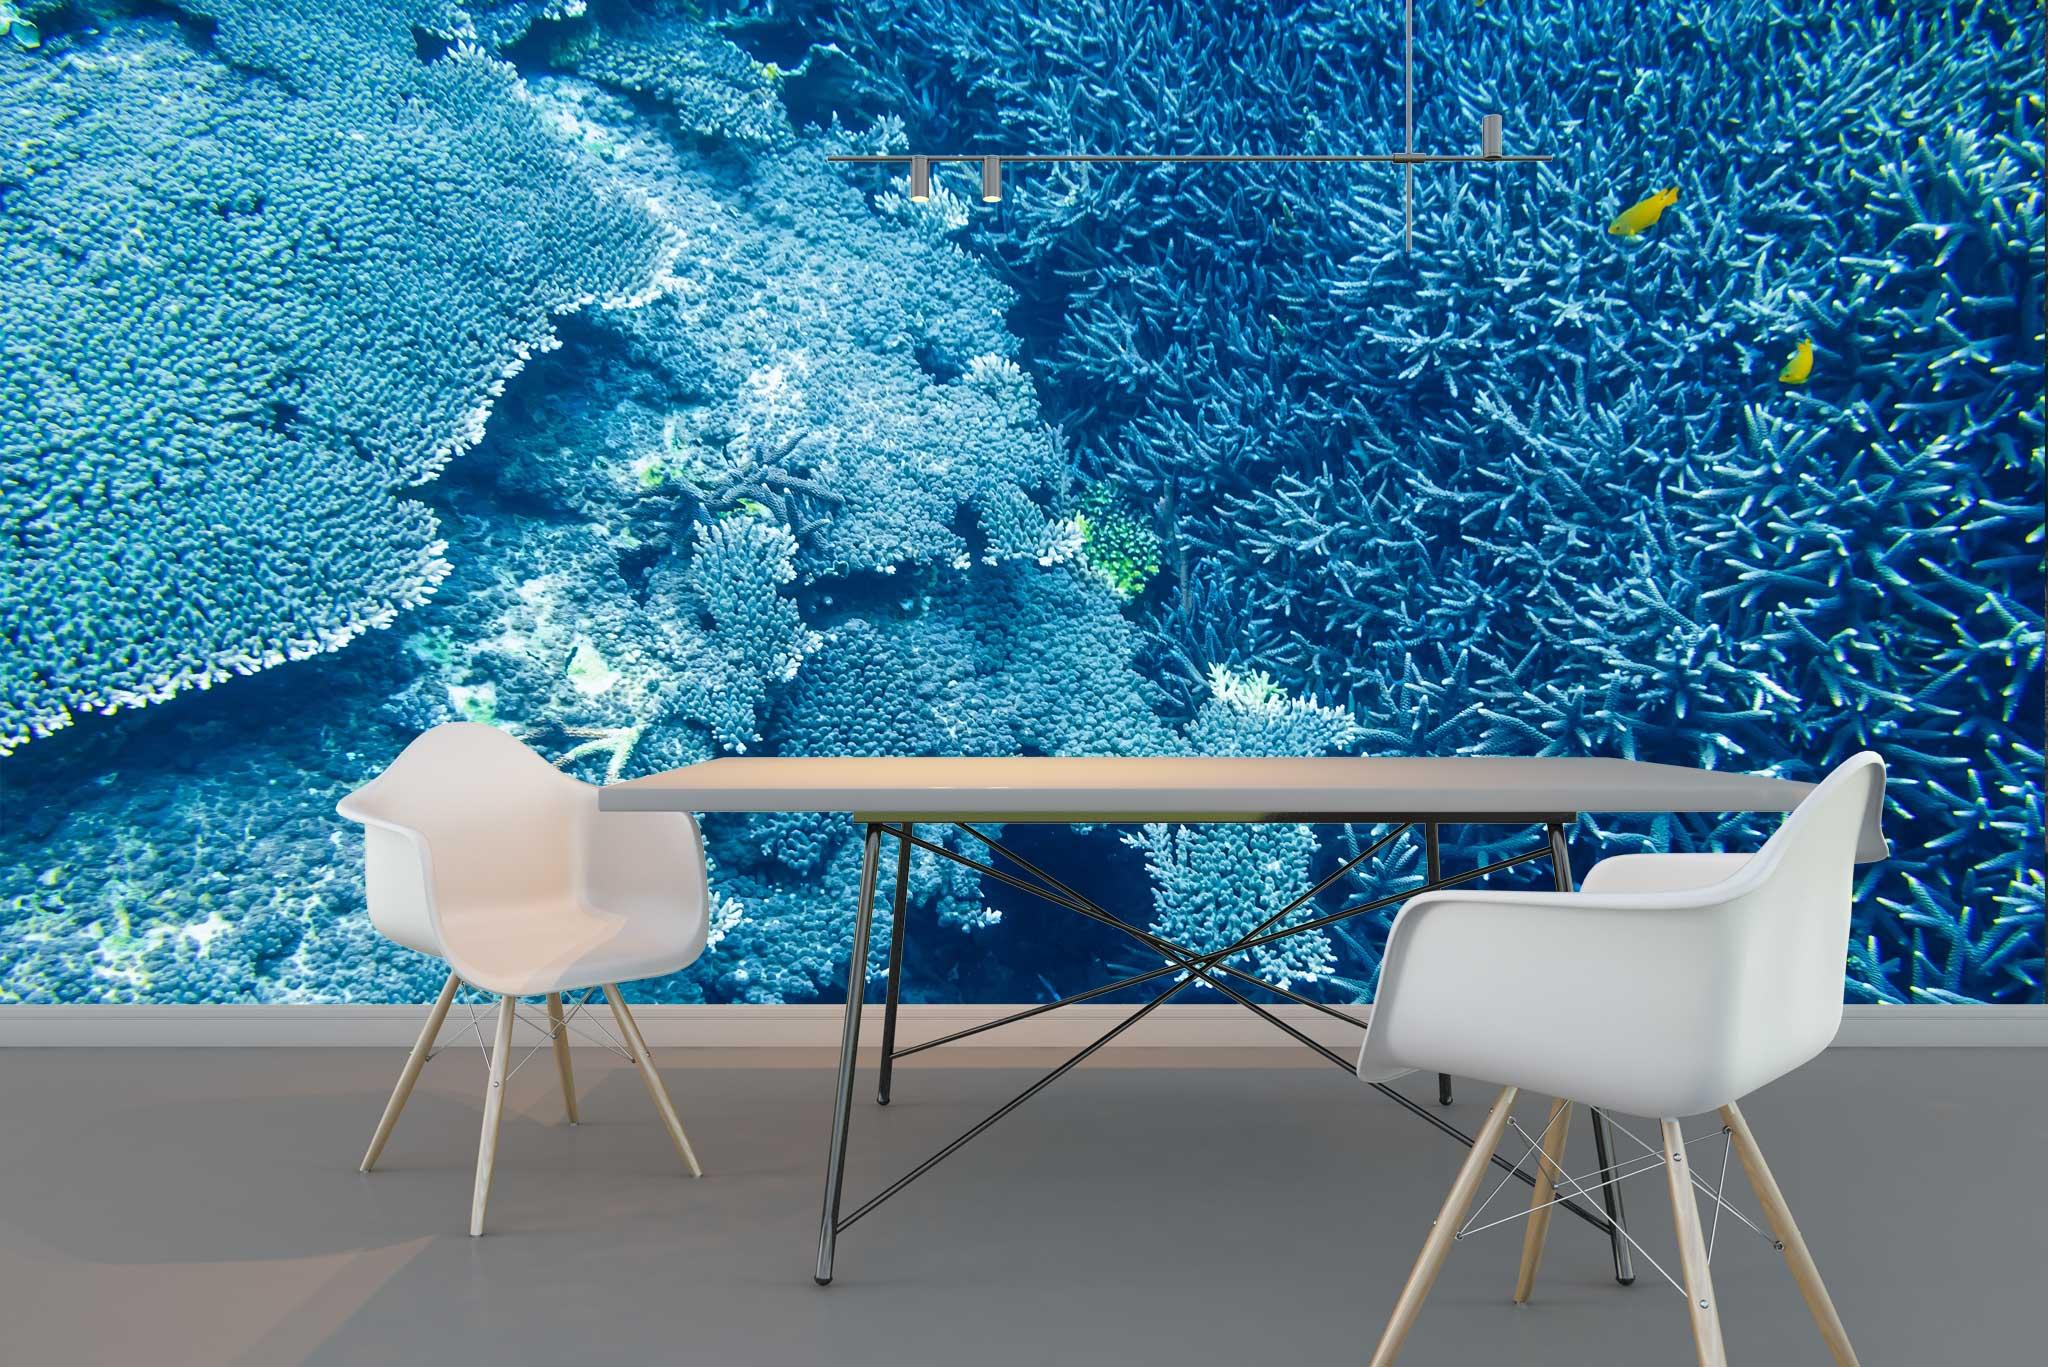 tapet-fototapet-comanda-personalizat-bucuresti-perete-special-lux-model-fotografie-subacvatica-ocean